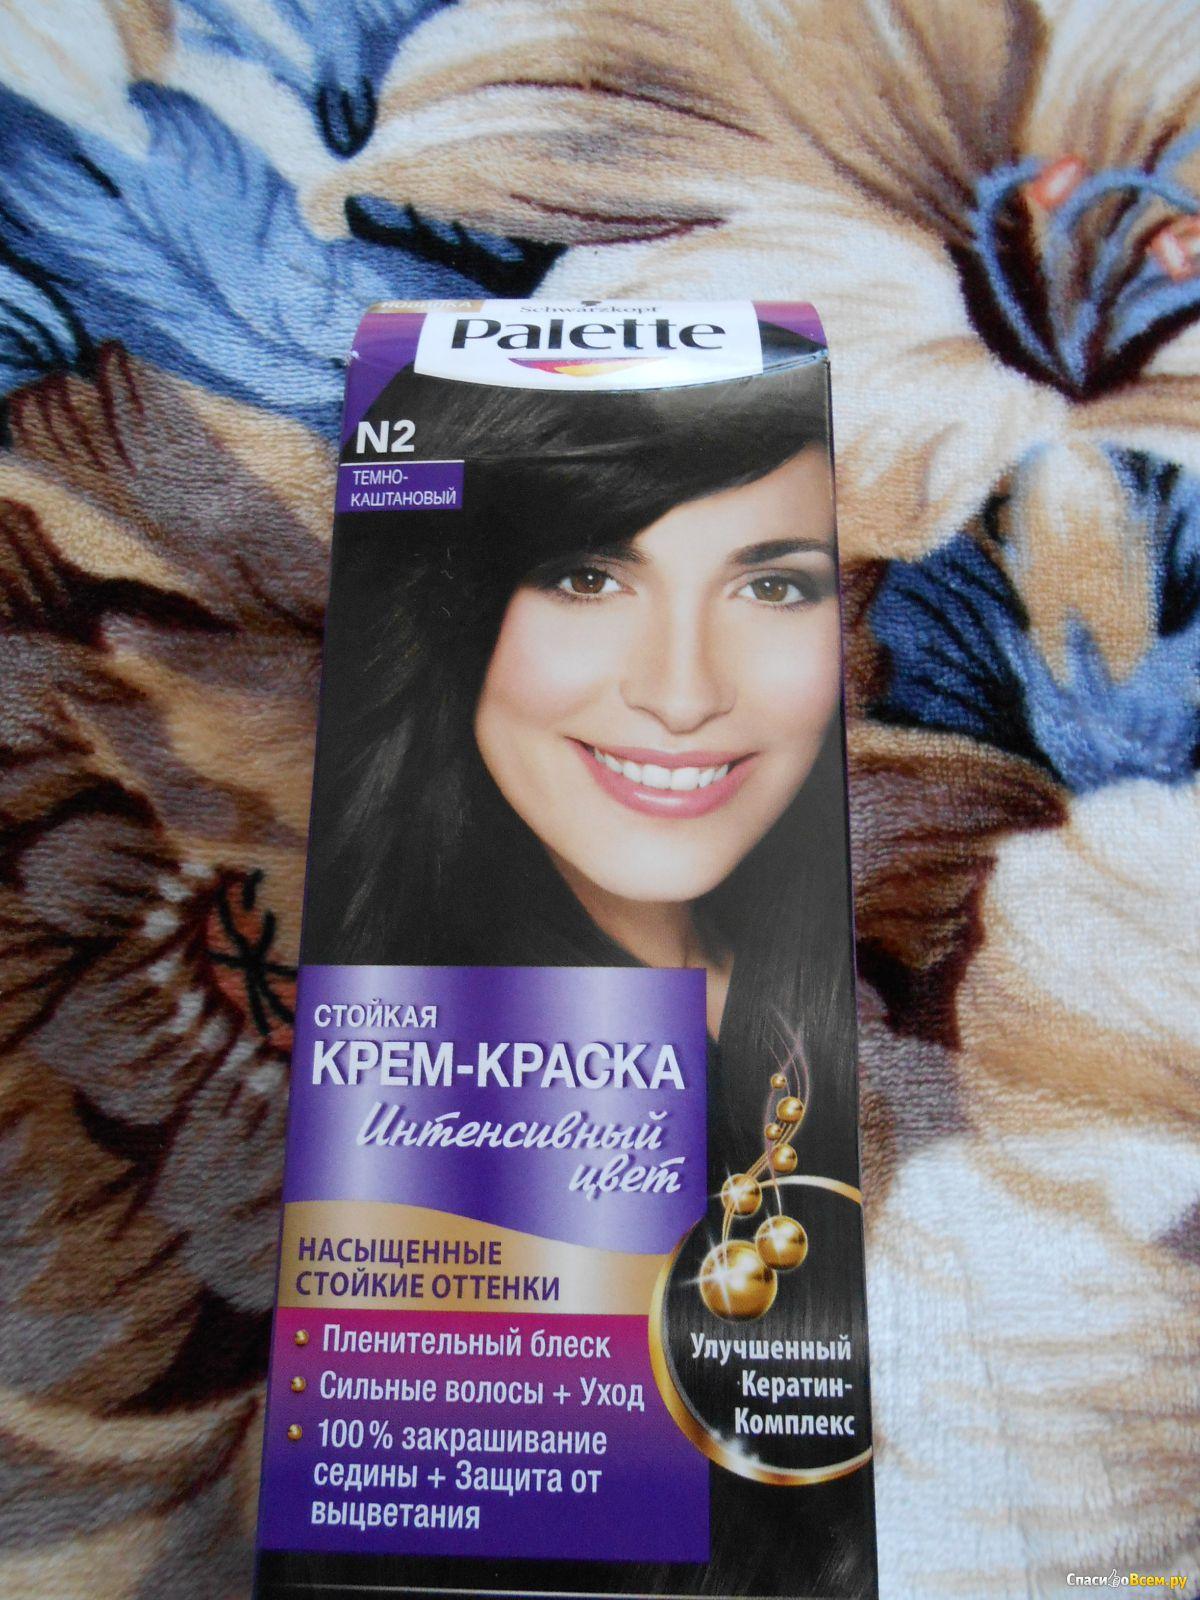 Краска палетт для темных волос